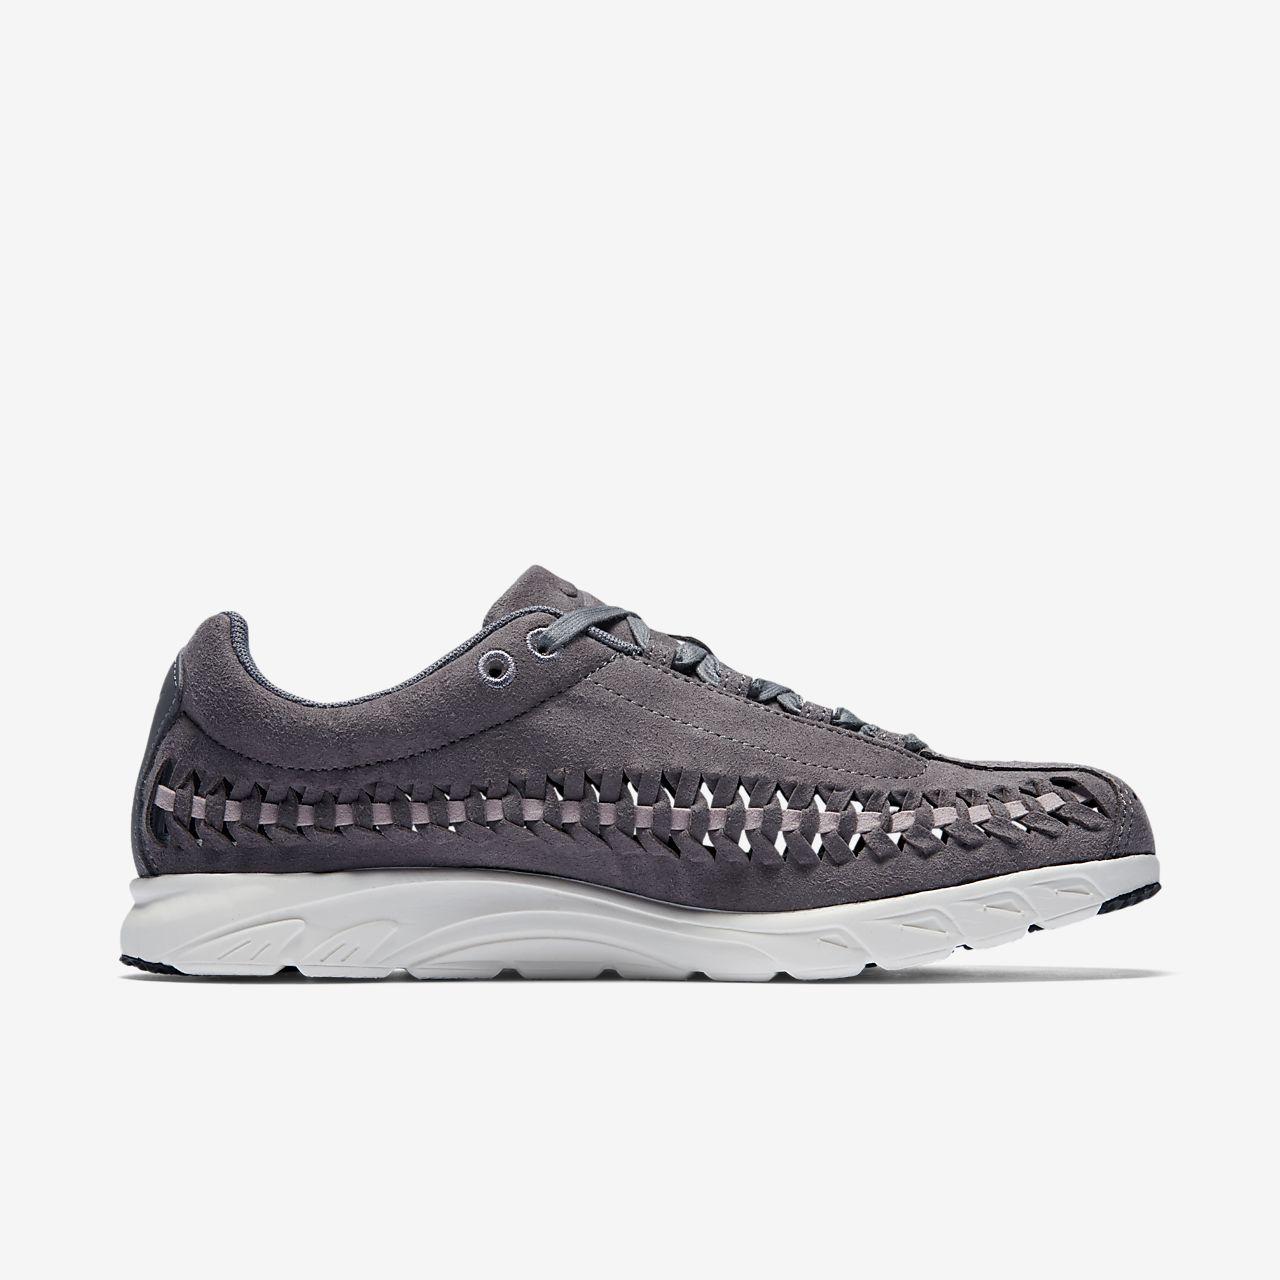 Nike Éphémères Chaussures Tissé Gris LpWYbNCaB0